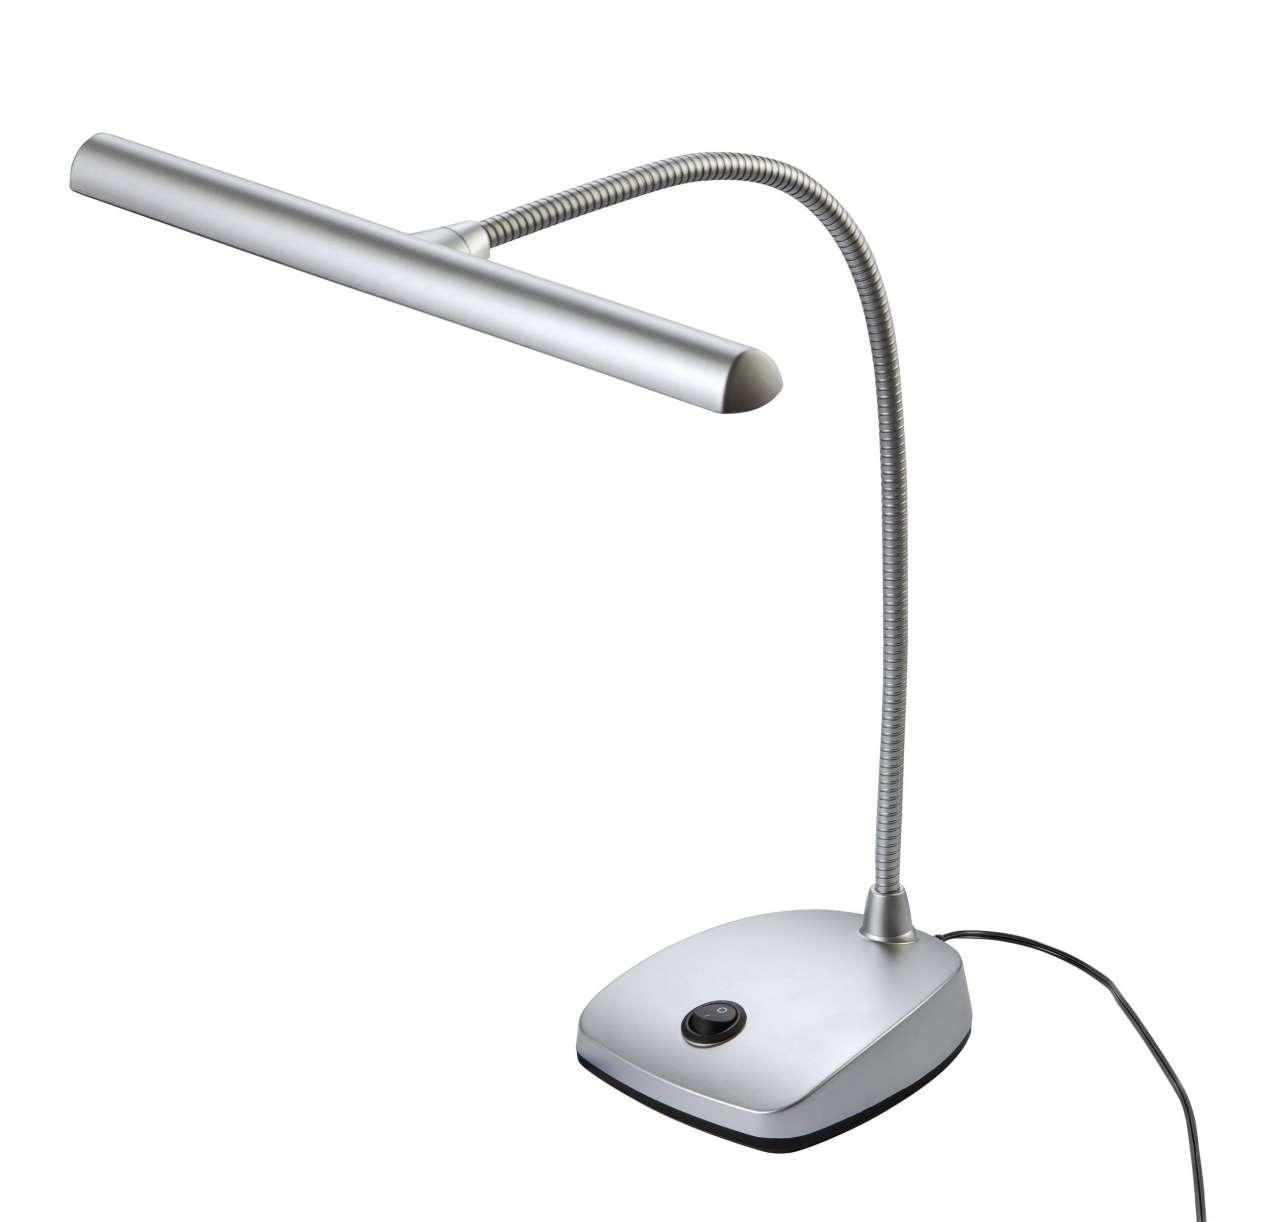 König & Meyer Pianolampe LED K&M 12297 - Chrome 12297-000-63